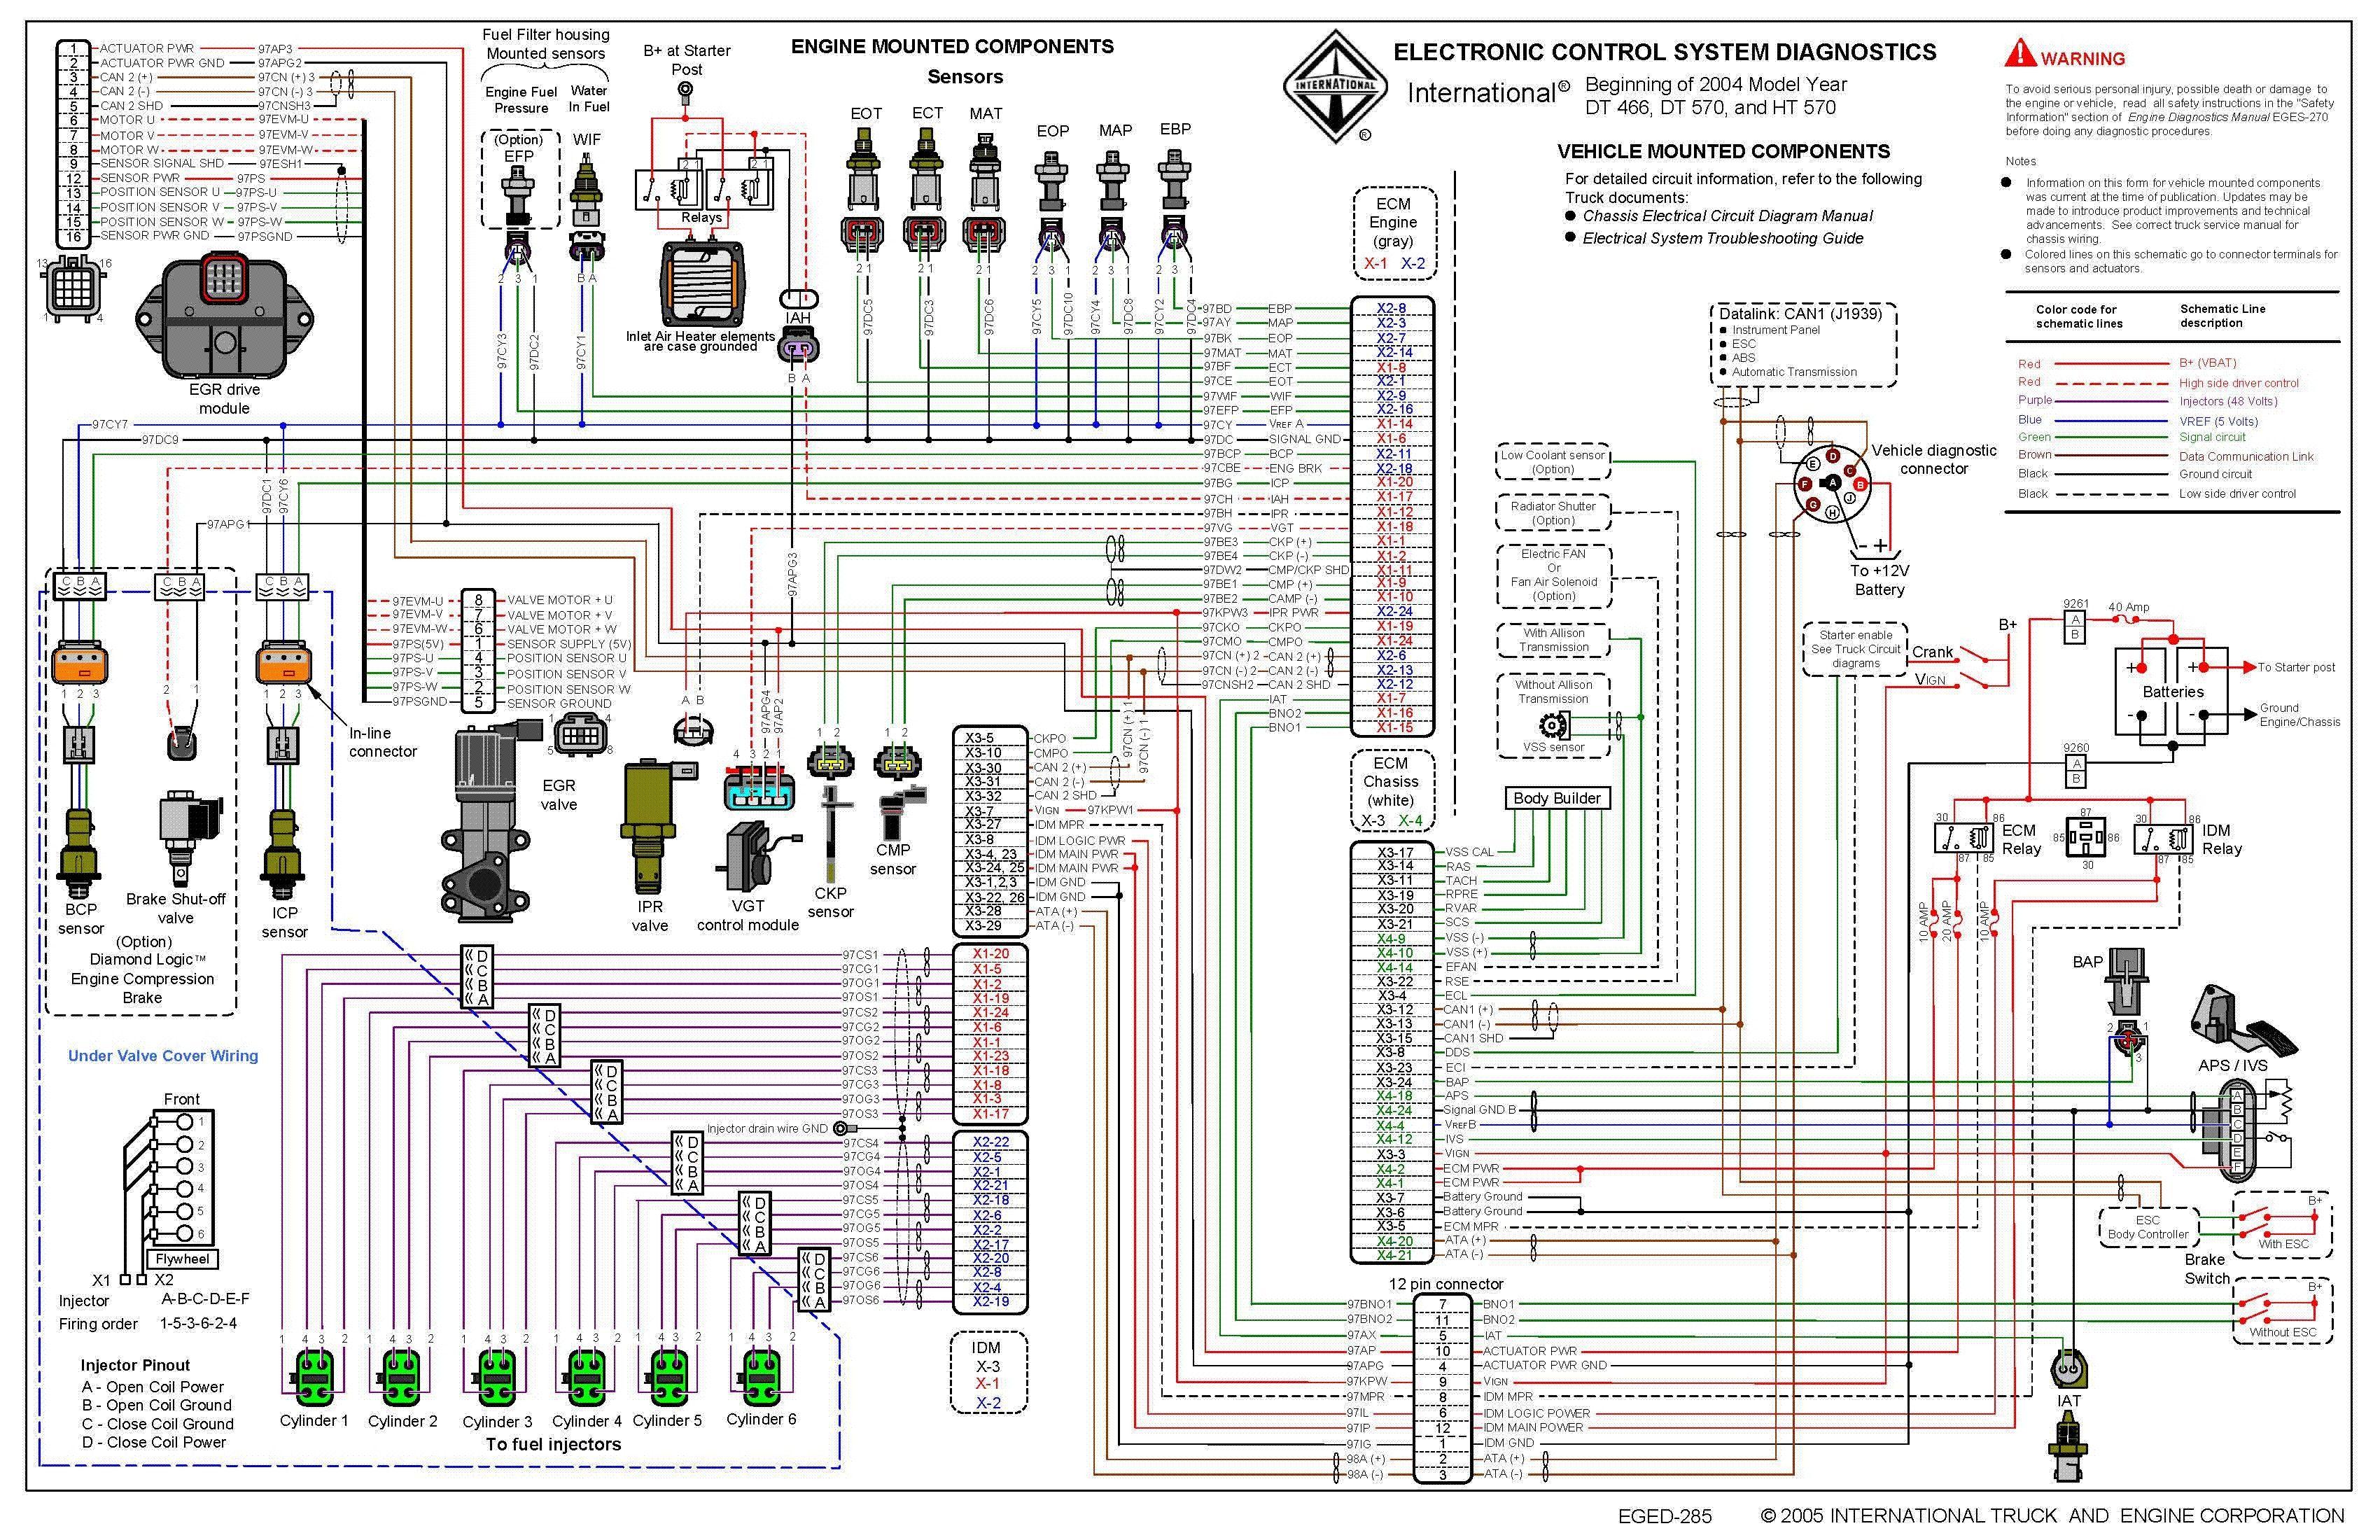 Ih Truck Wiring Diagram